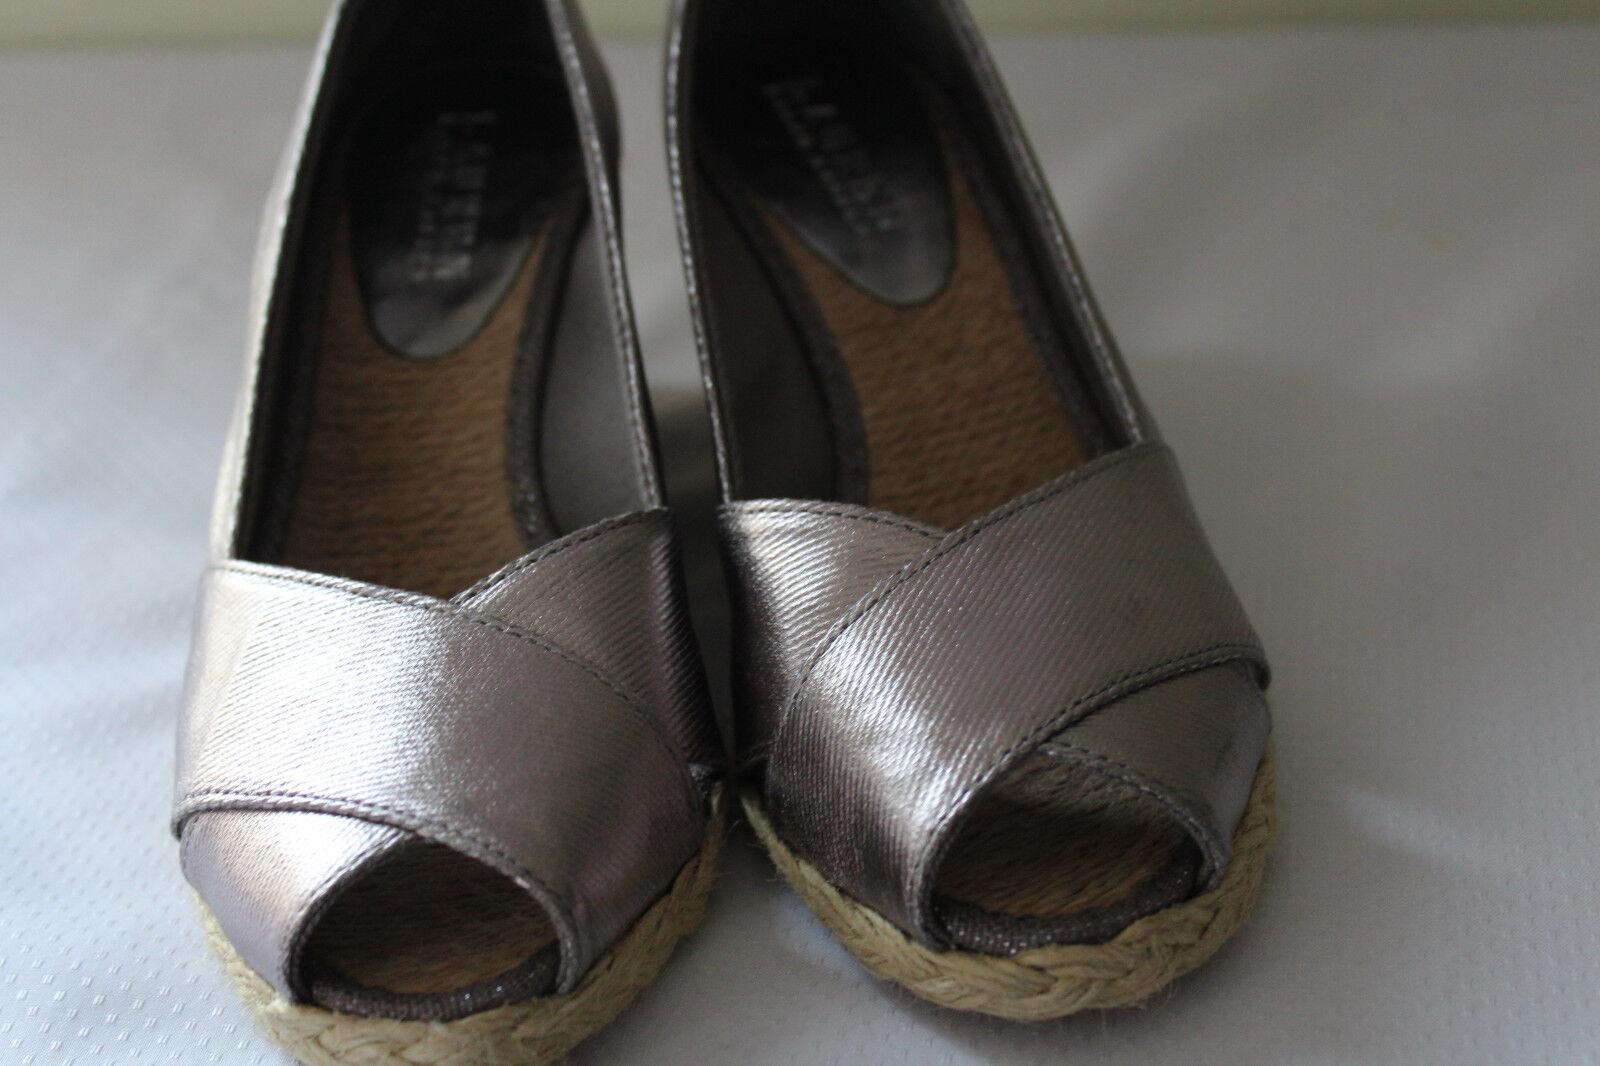 NEW Ralph Lauren Cecilia Silver Silver Silver pink Metallic PeepToe Espadrille Sandals 5B  108 bf185d